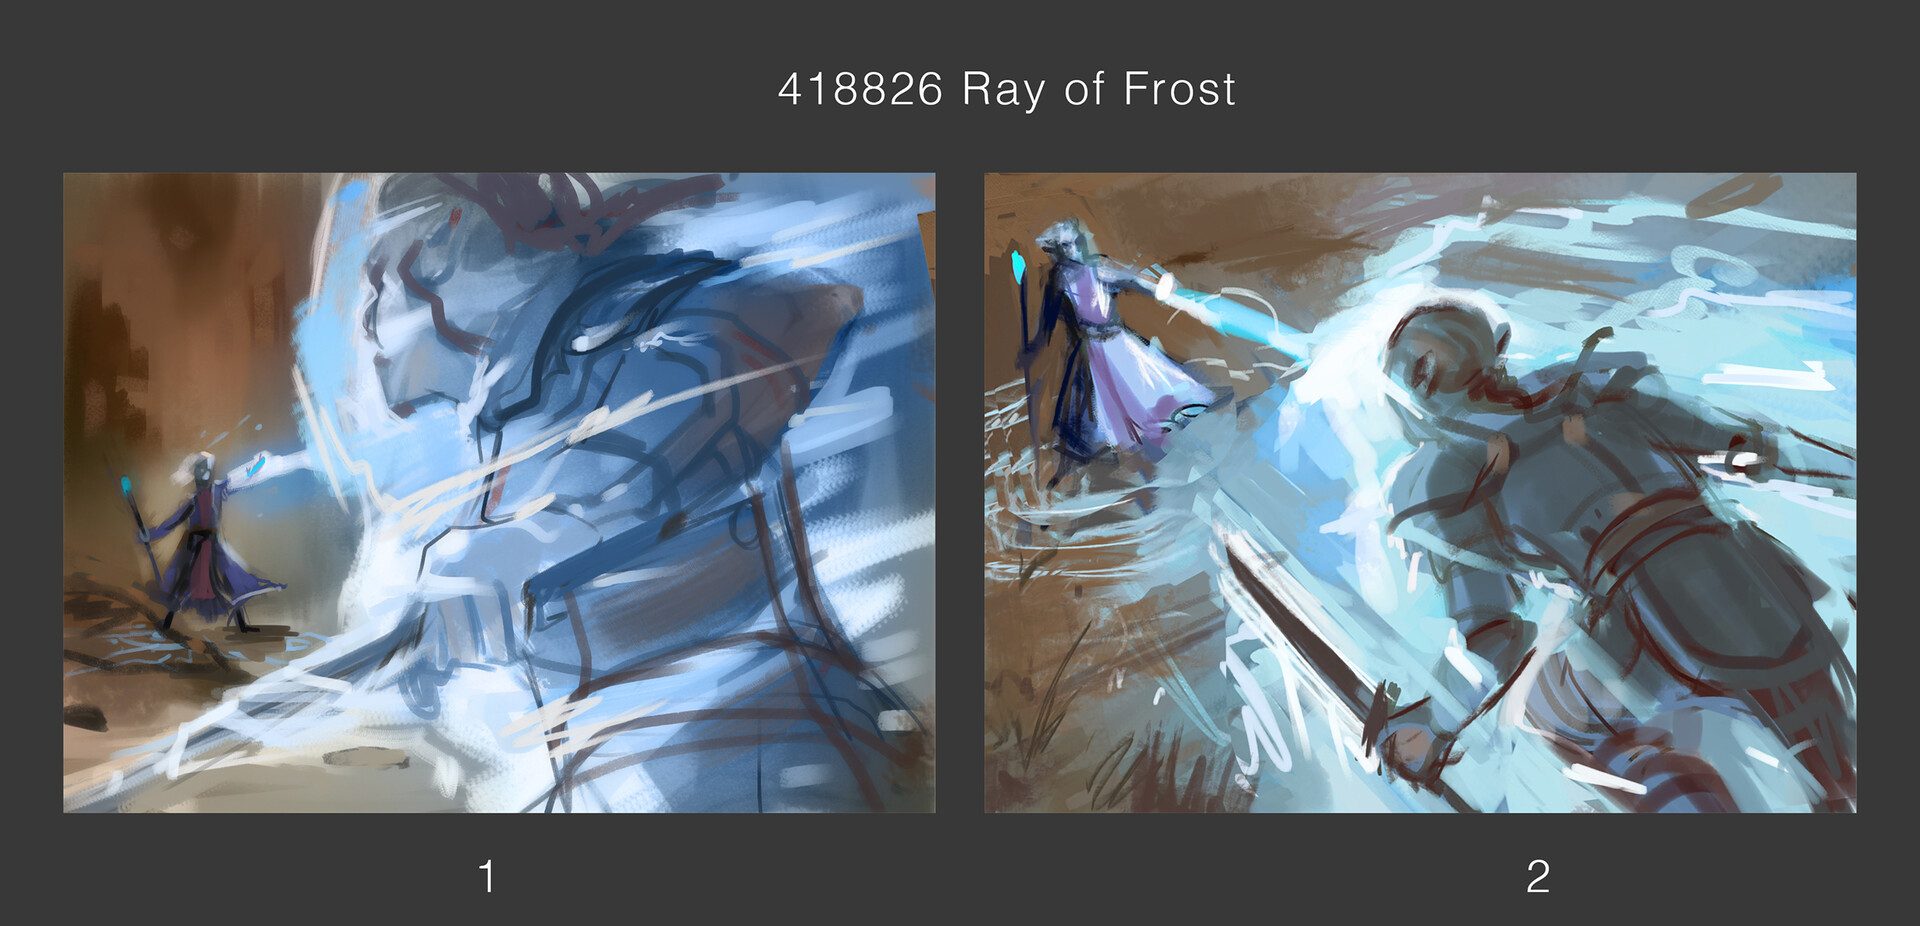 https://youre.outof.cards/media/uploads/ad/7f/ad7f67ce-01f7-43ea-aca0-4f0969d0726b/rayoffrost_sketch_kimsokol.jpg